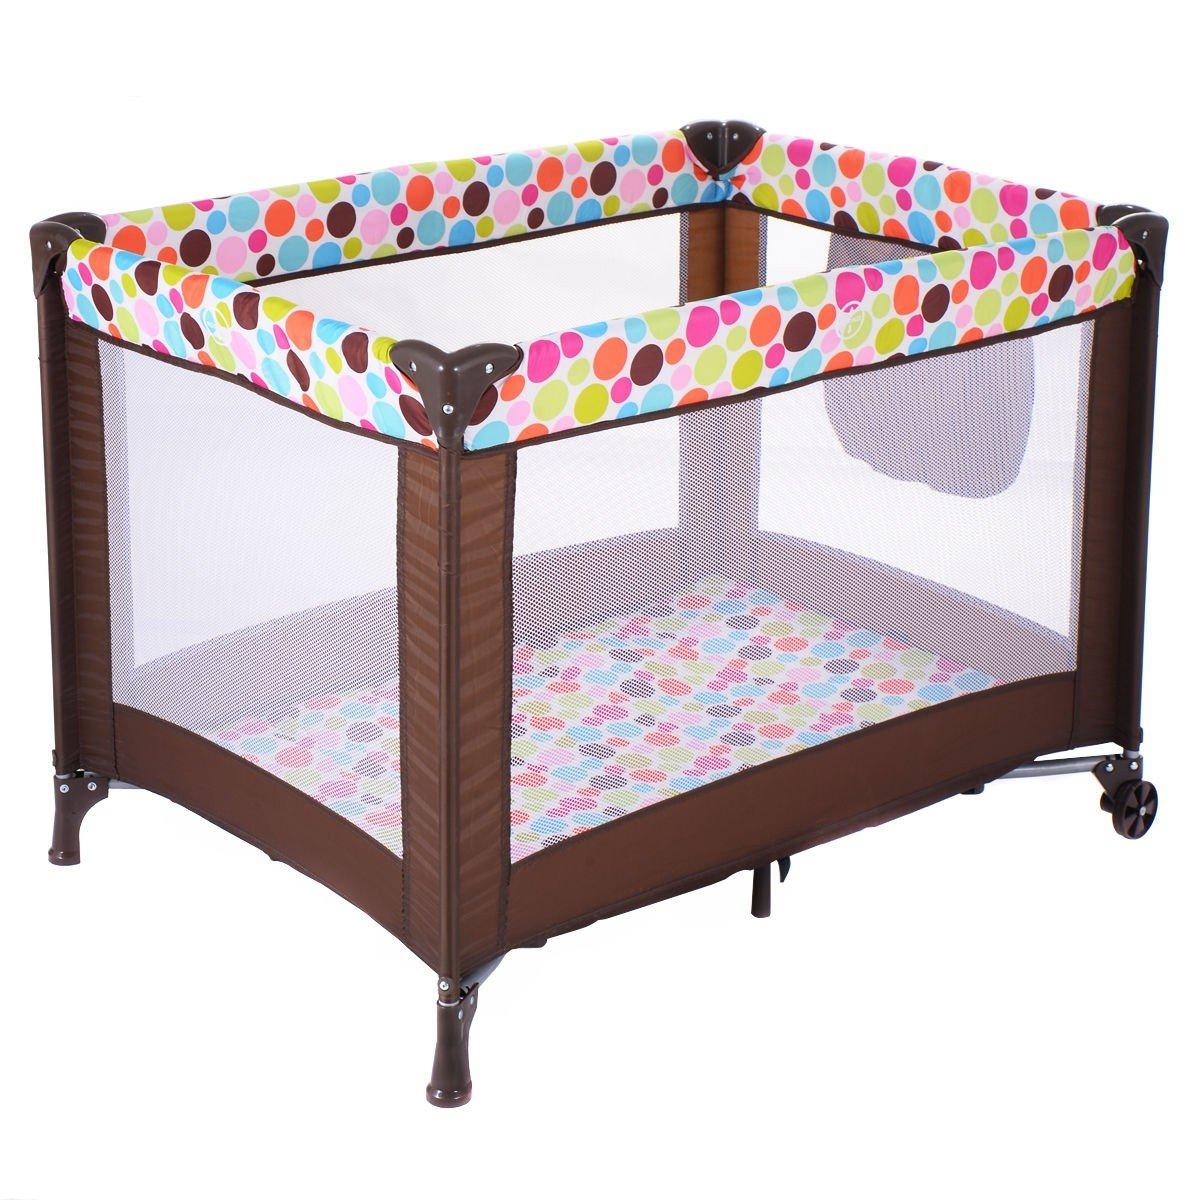 Portable Baby Playpen Bedding Infant Children Kids Furniture With Ebook